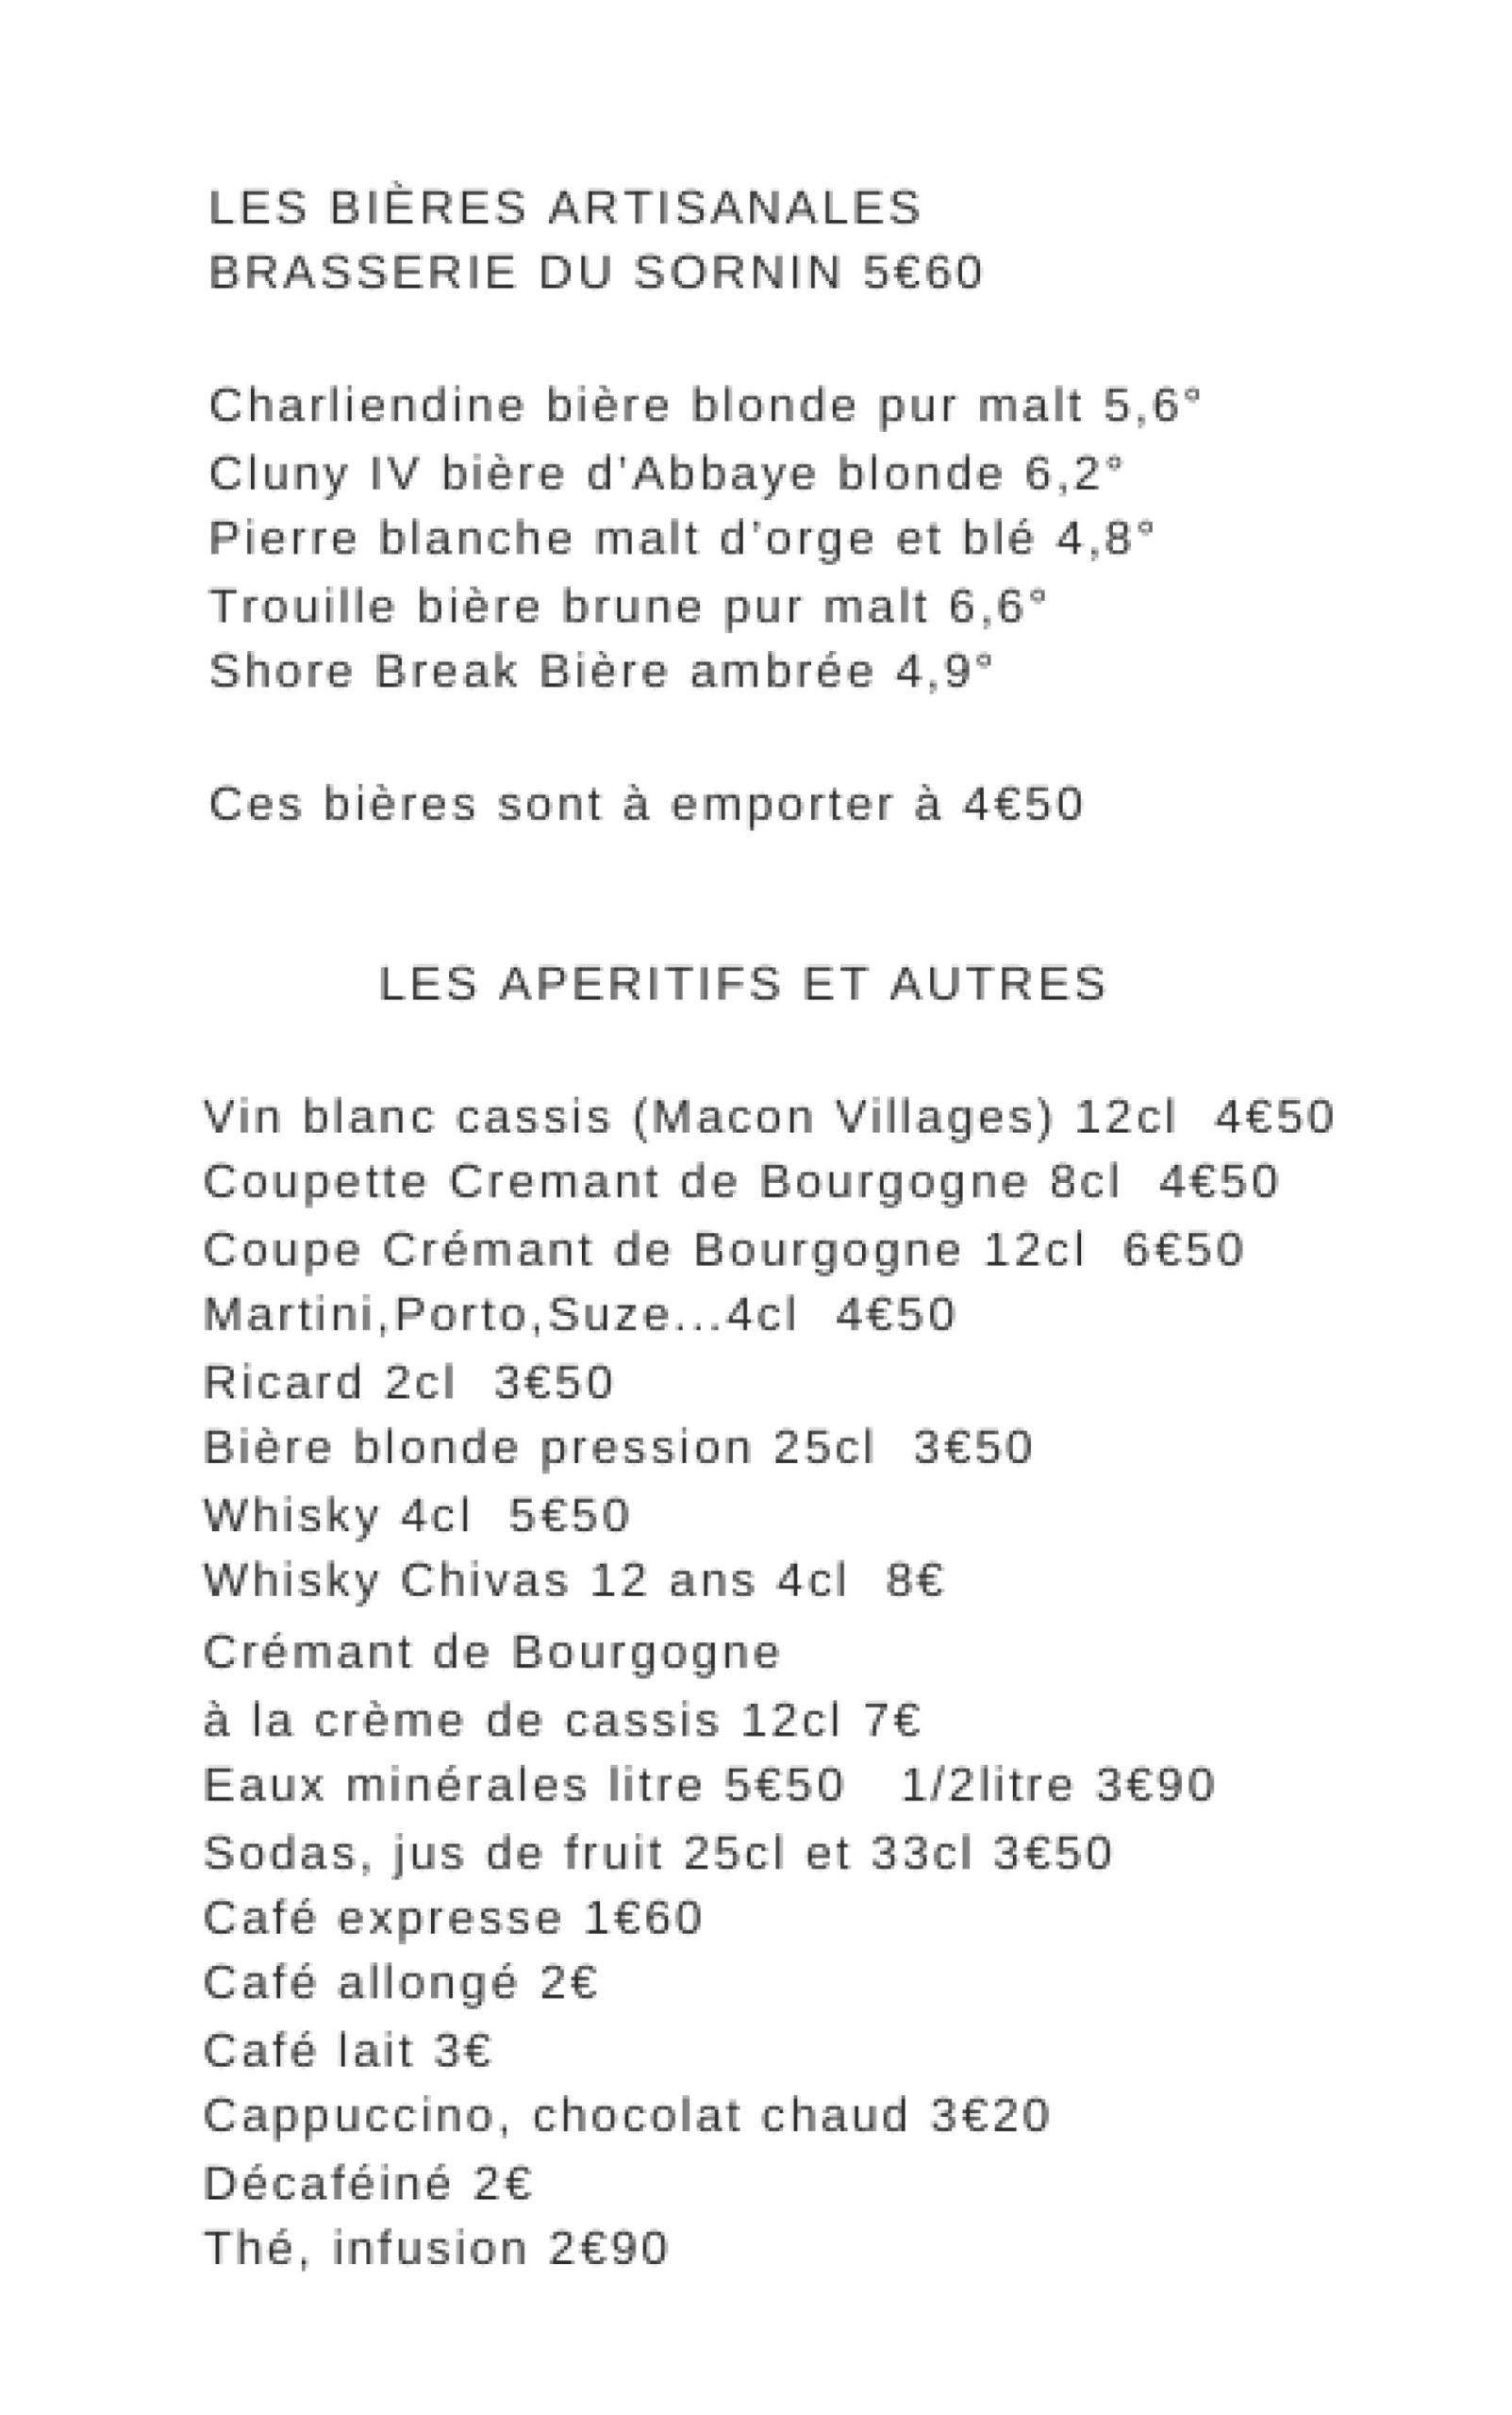 menu-halte-abbaye-arret-sur-image-3